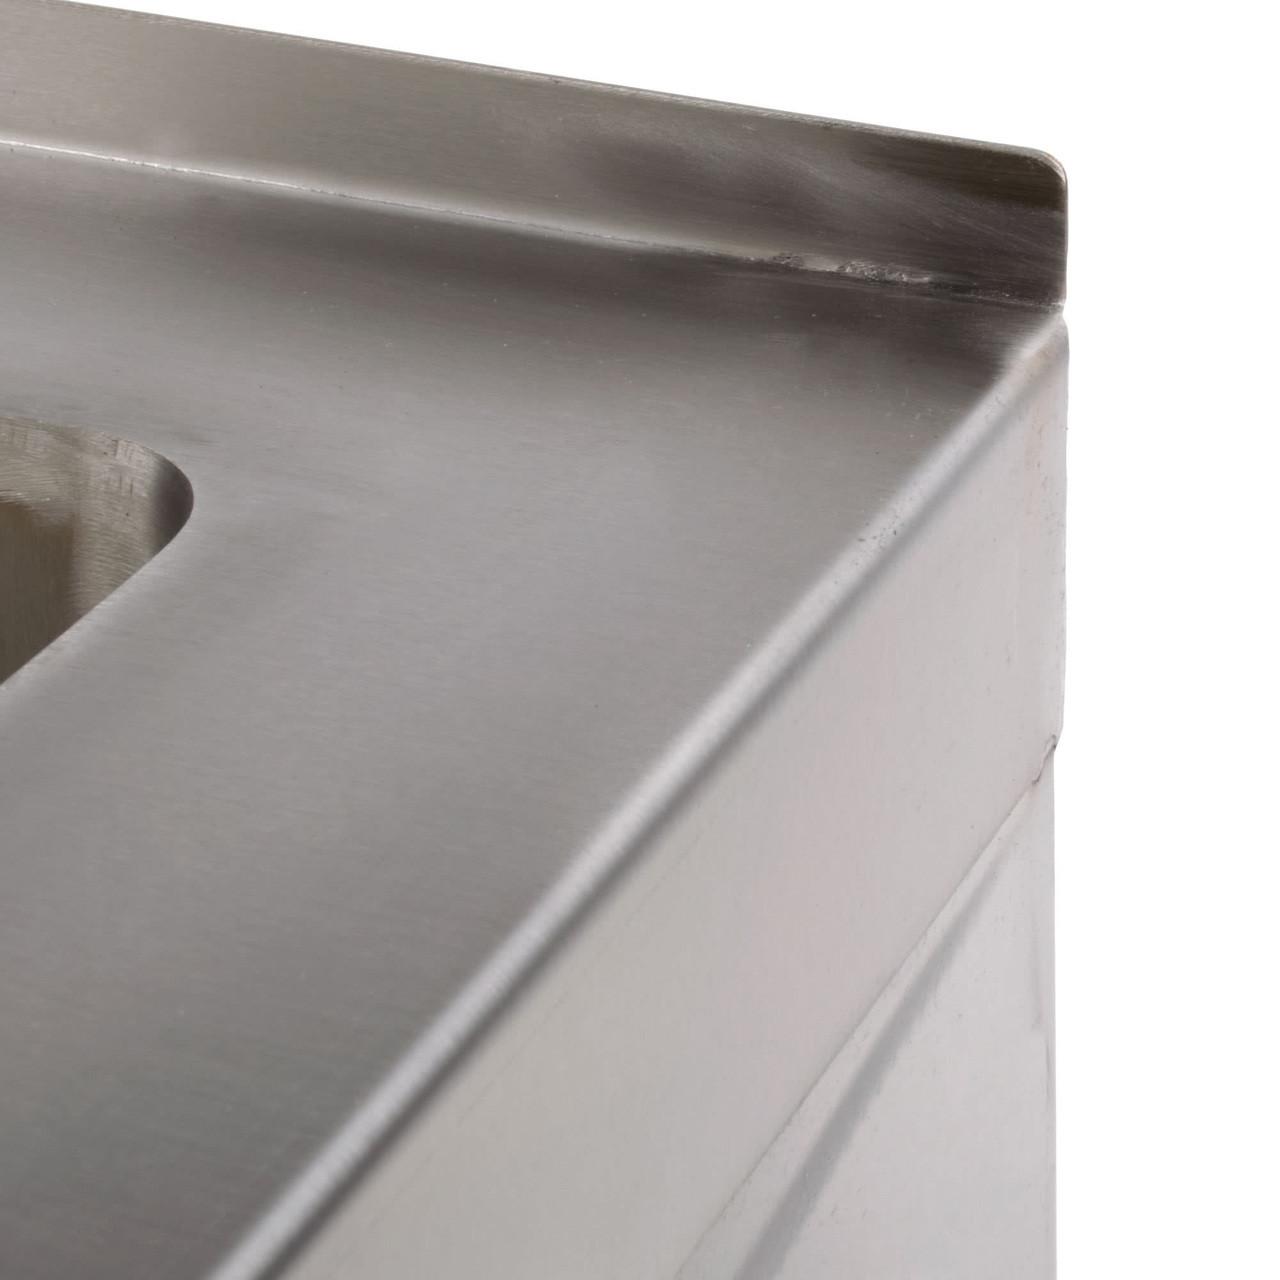 "Floor Mounted Mop Sink  25""W x 21""D x 16""H"